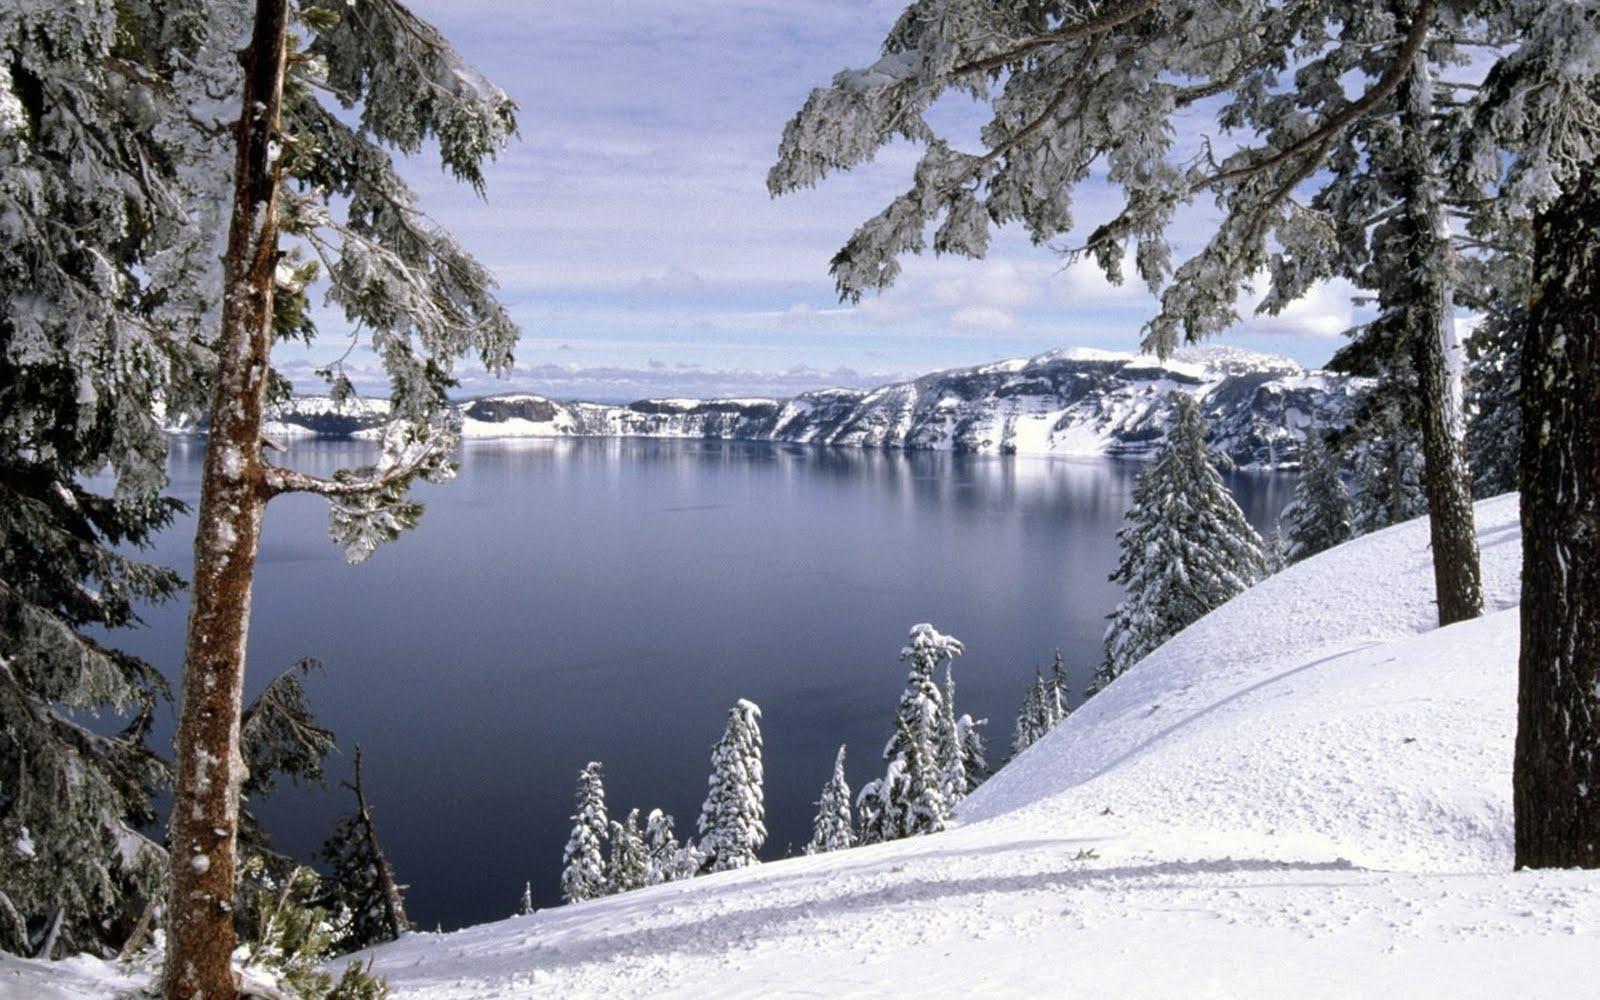 Winter+Scenery+%25285%2529 Template Application Web Asp Net on logo png, web development, core architecture, web application, mvc framework,